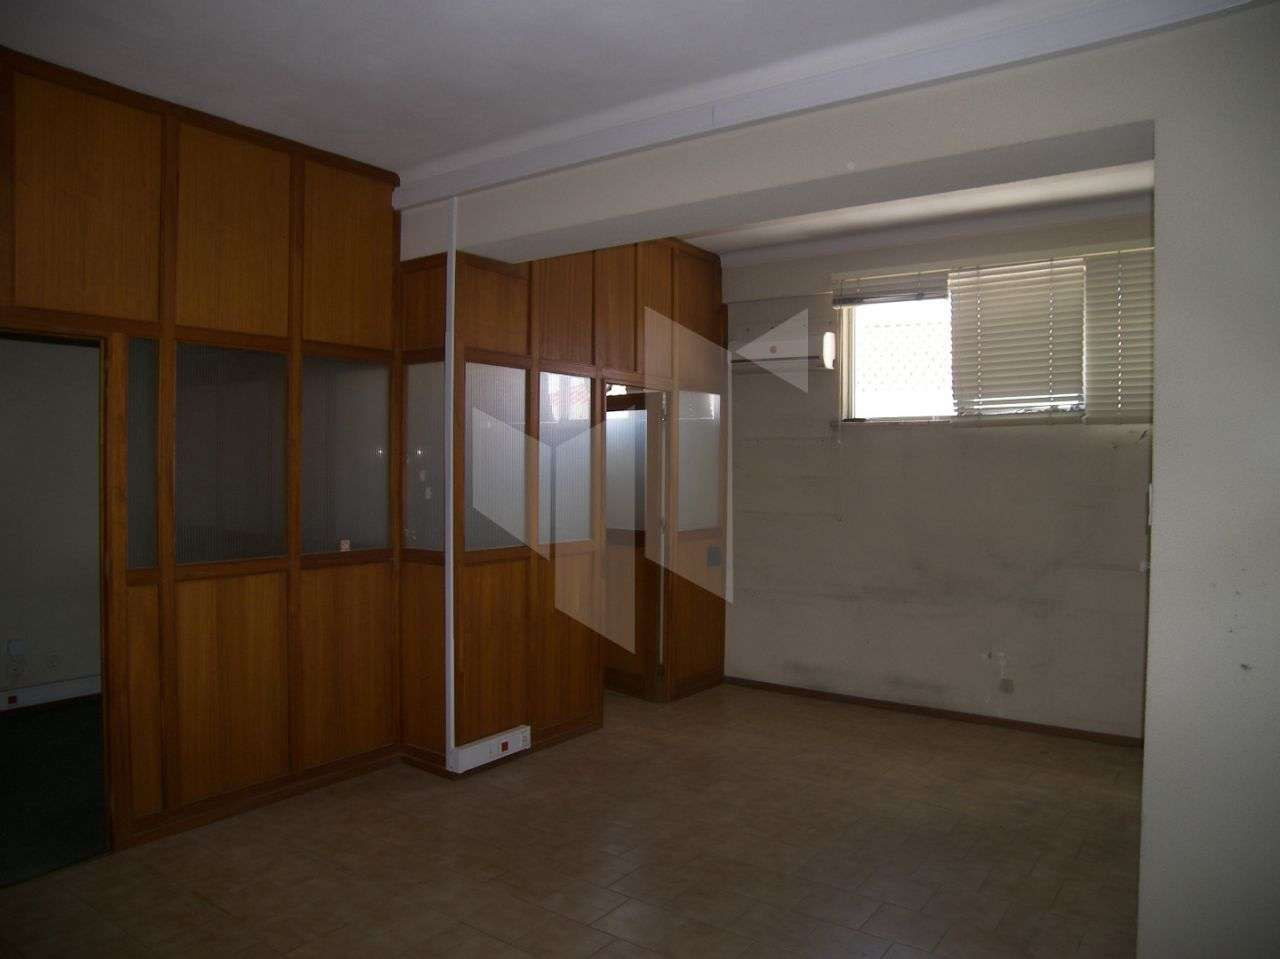 Escritório para arrendar, Tondela e Nandufe, Tondela, Viseu - Foto 6